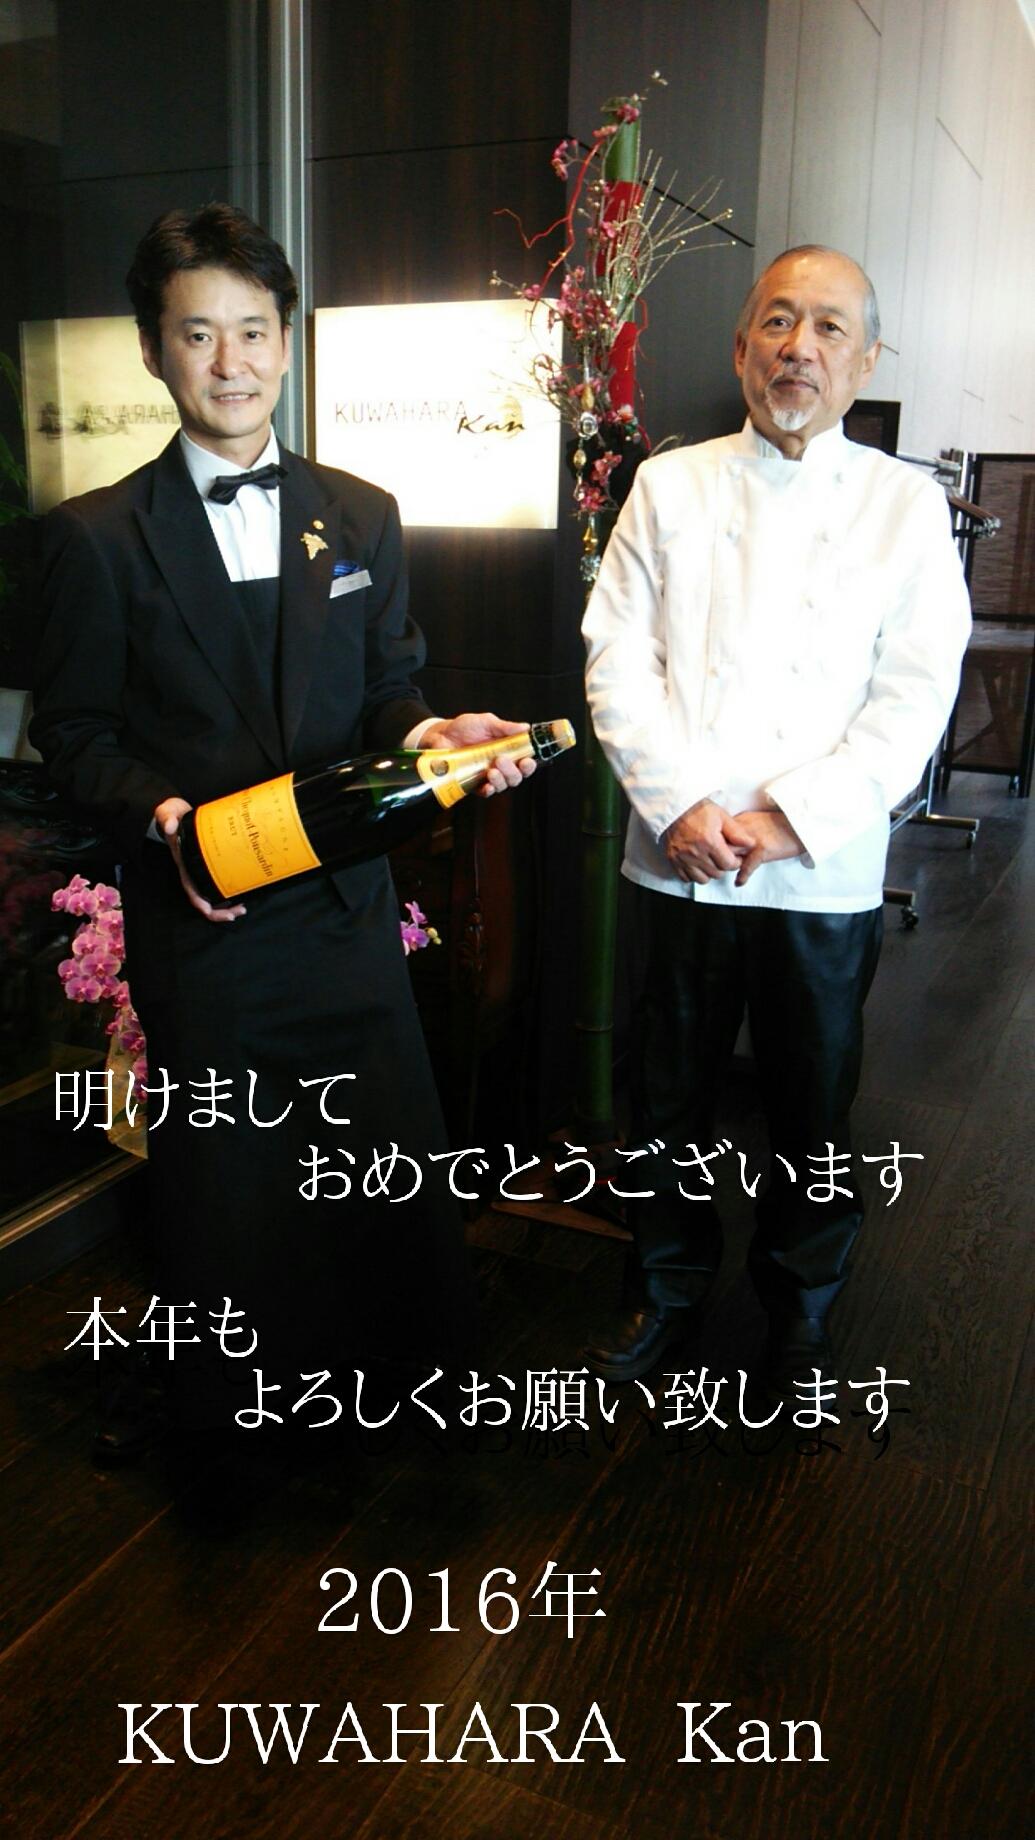 2016-01-01_11.35.44